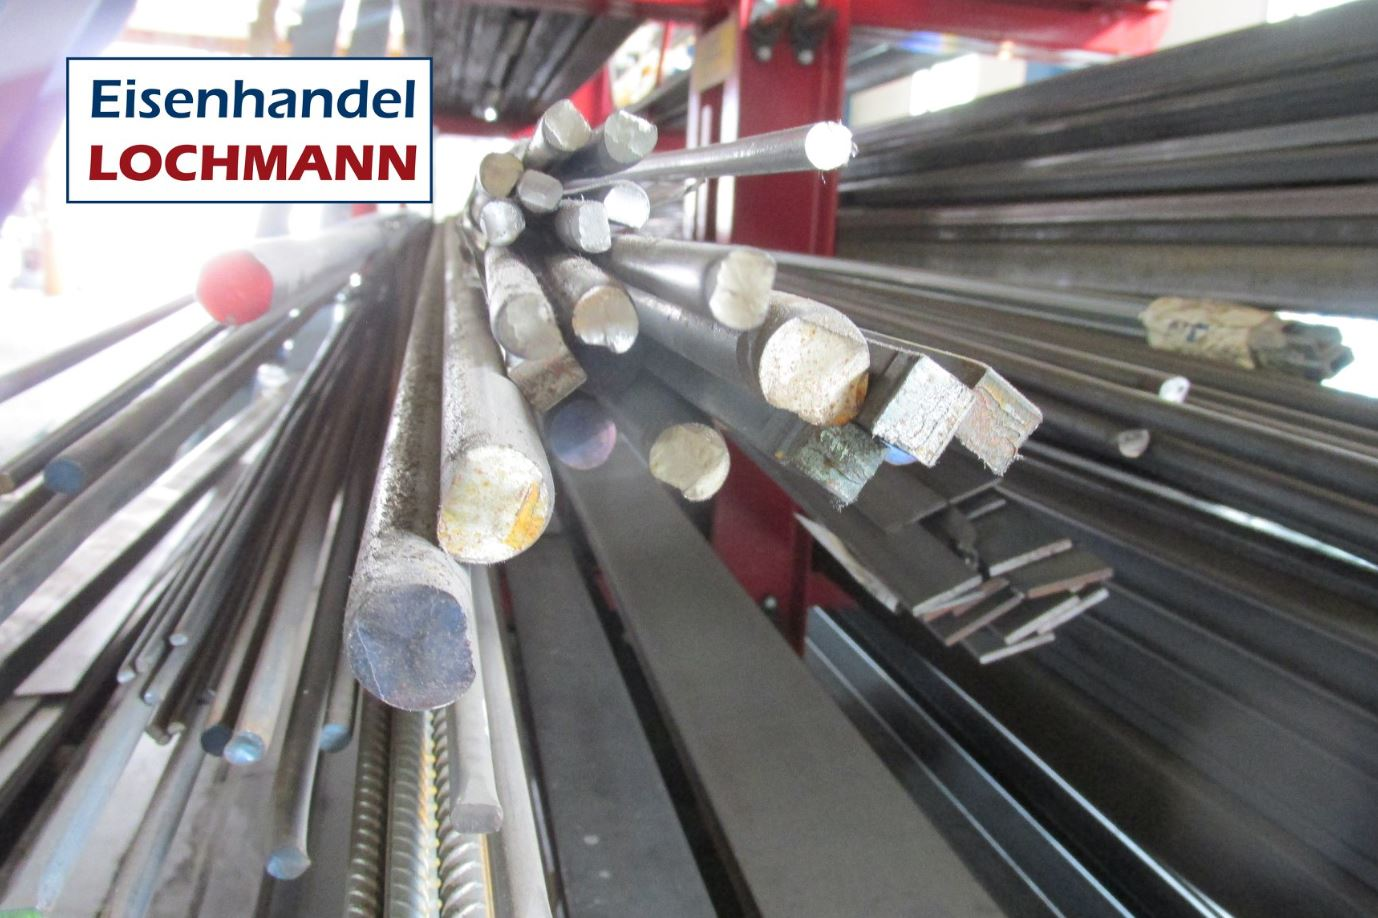 Eisenhandel Lochmann